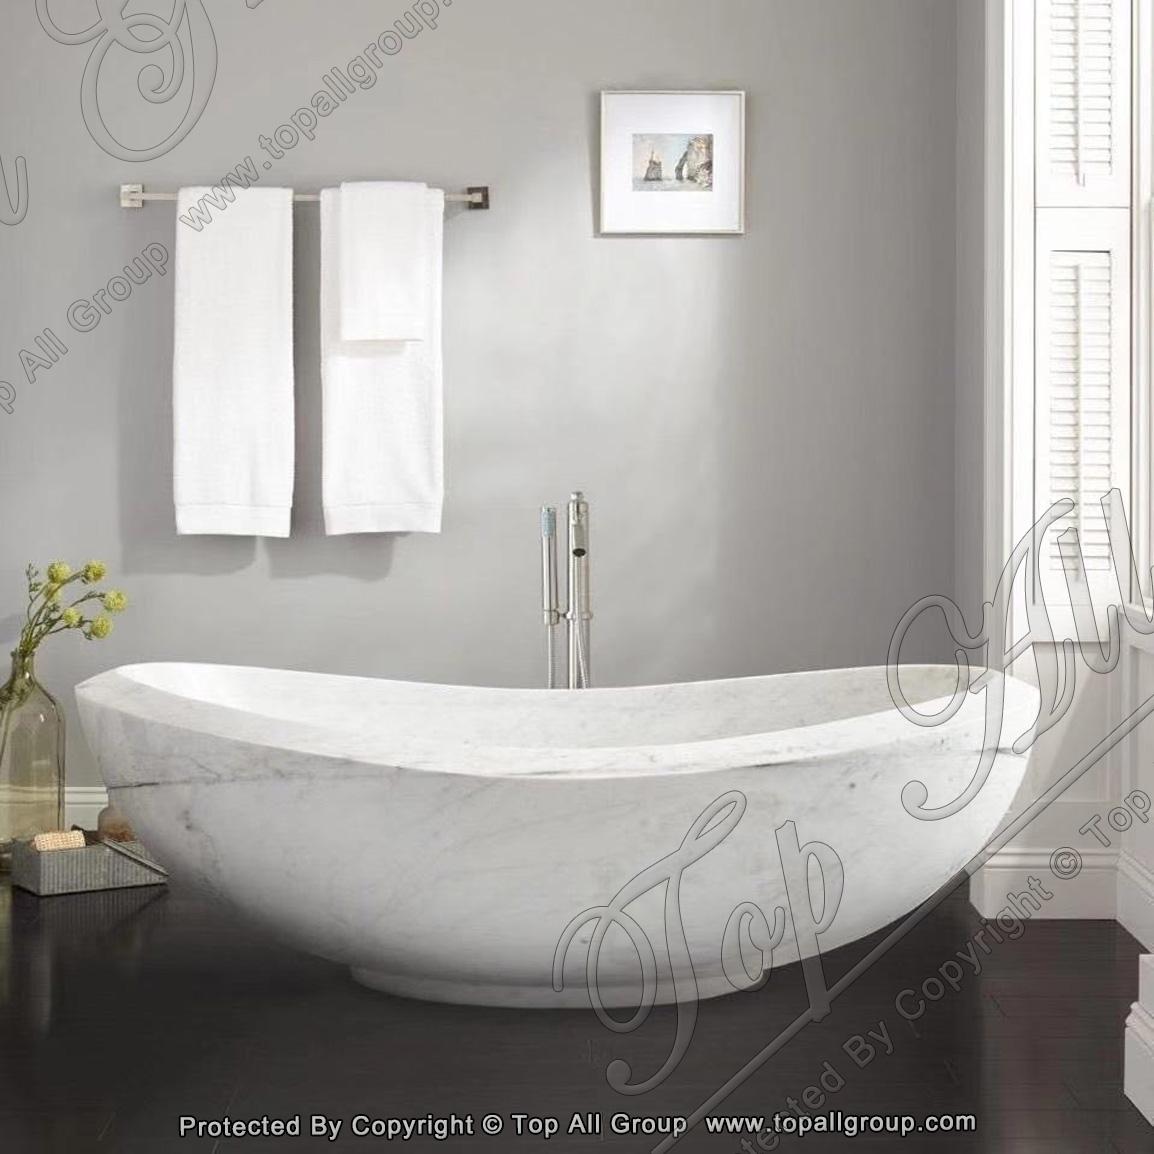 White Marble Stone Bathtub For Sale